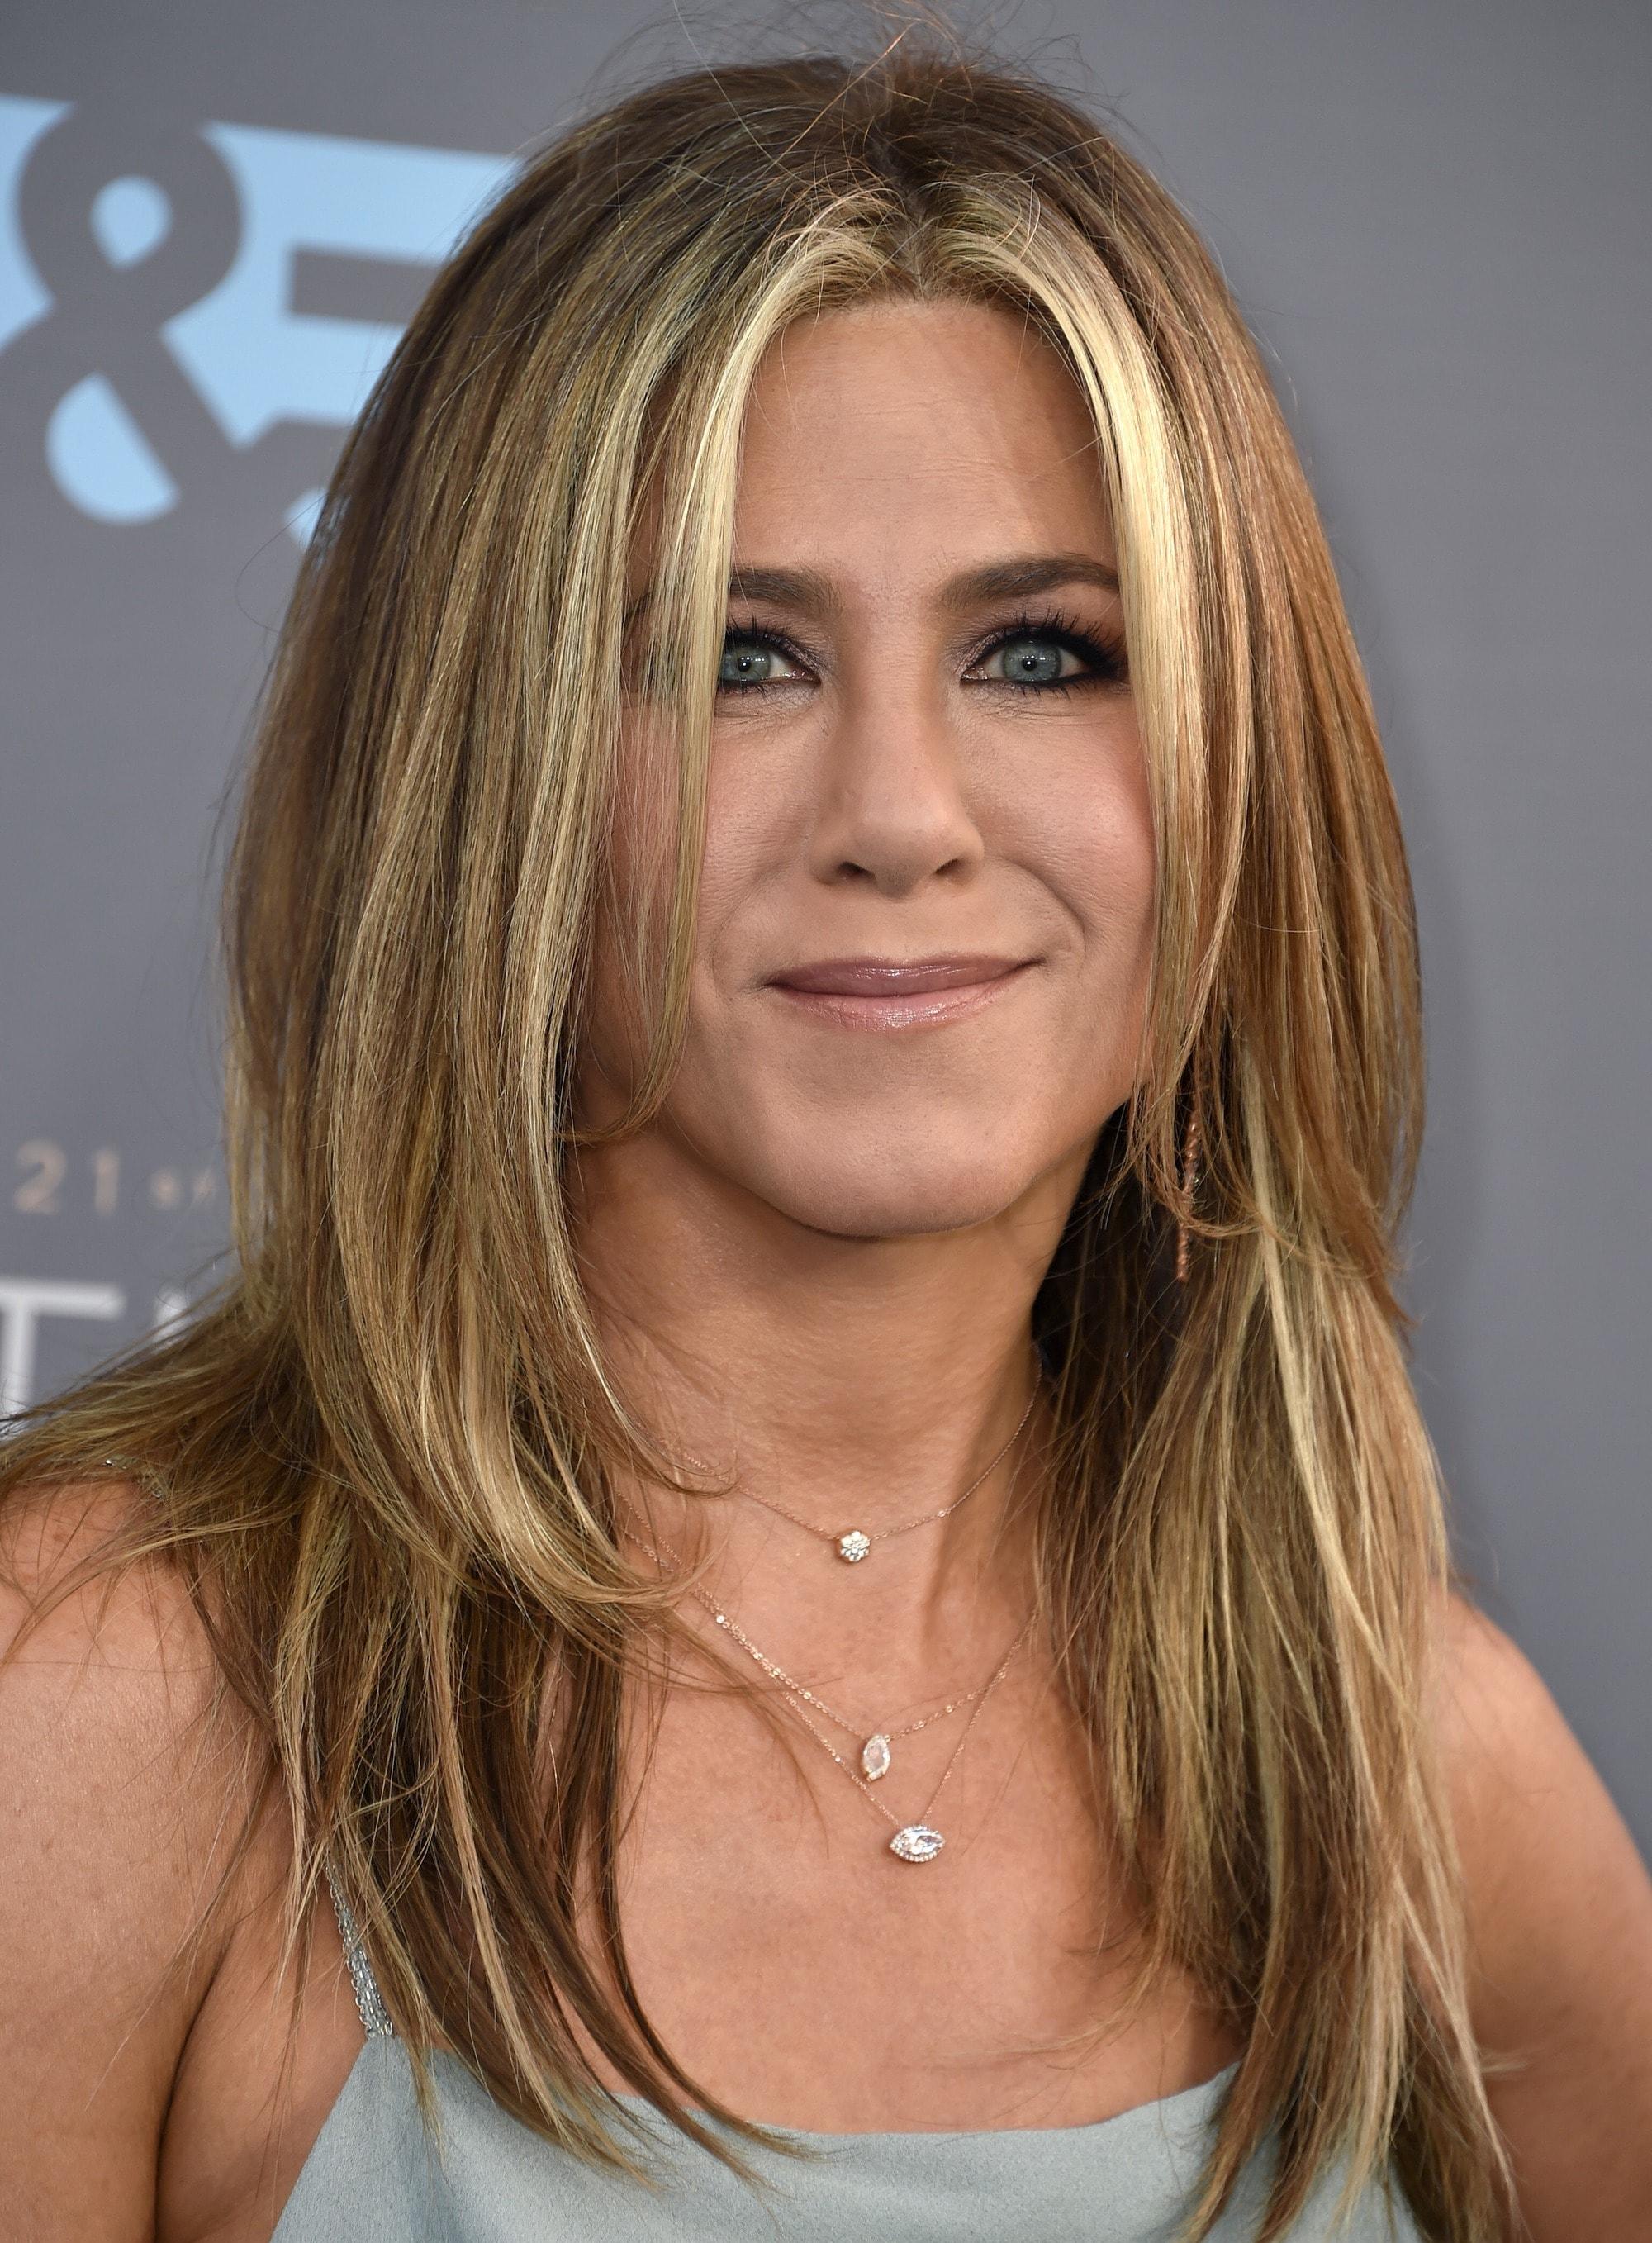 Choppy hair - Jennifer Aniston - Choppy layers